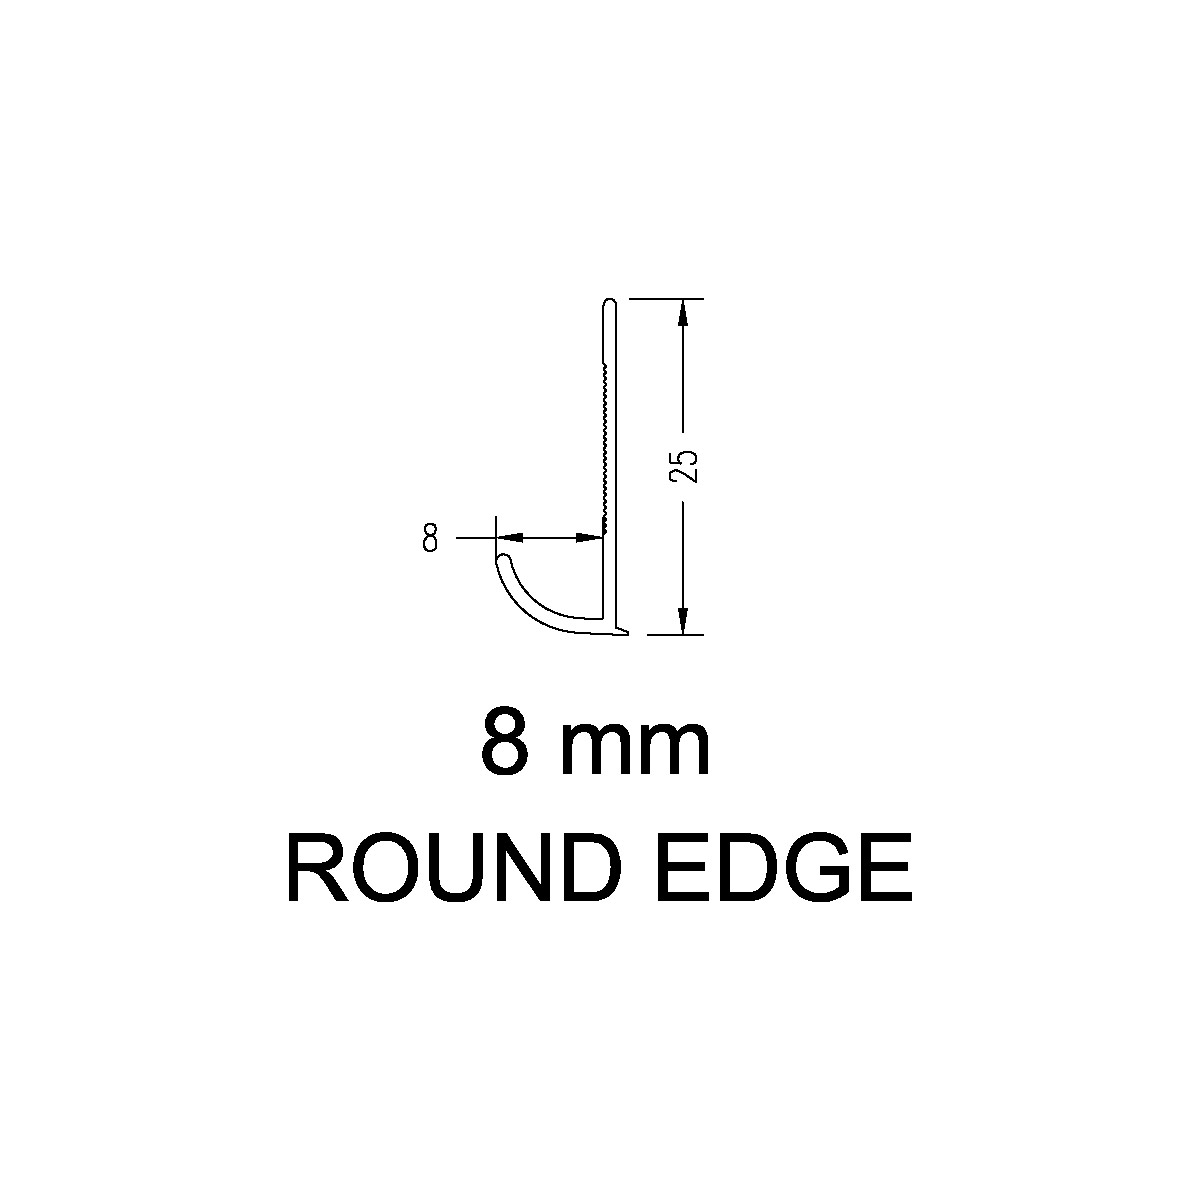 Round Edge – 8mm